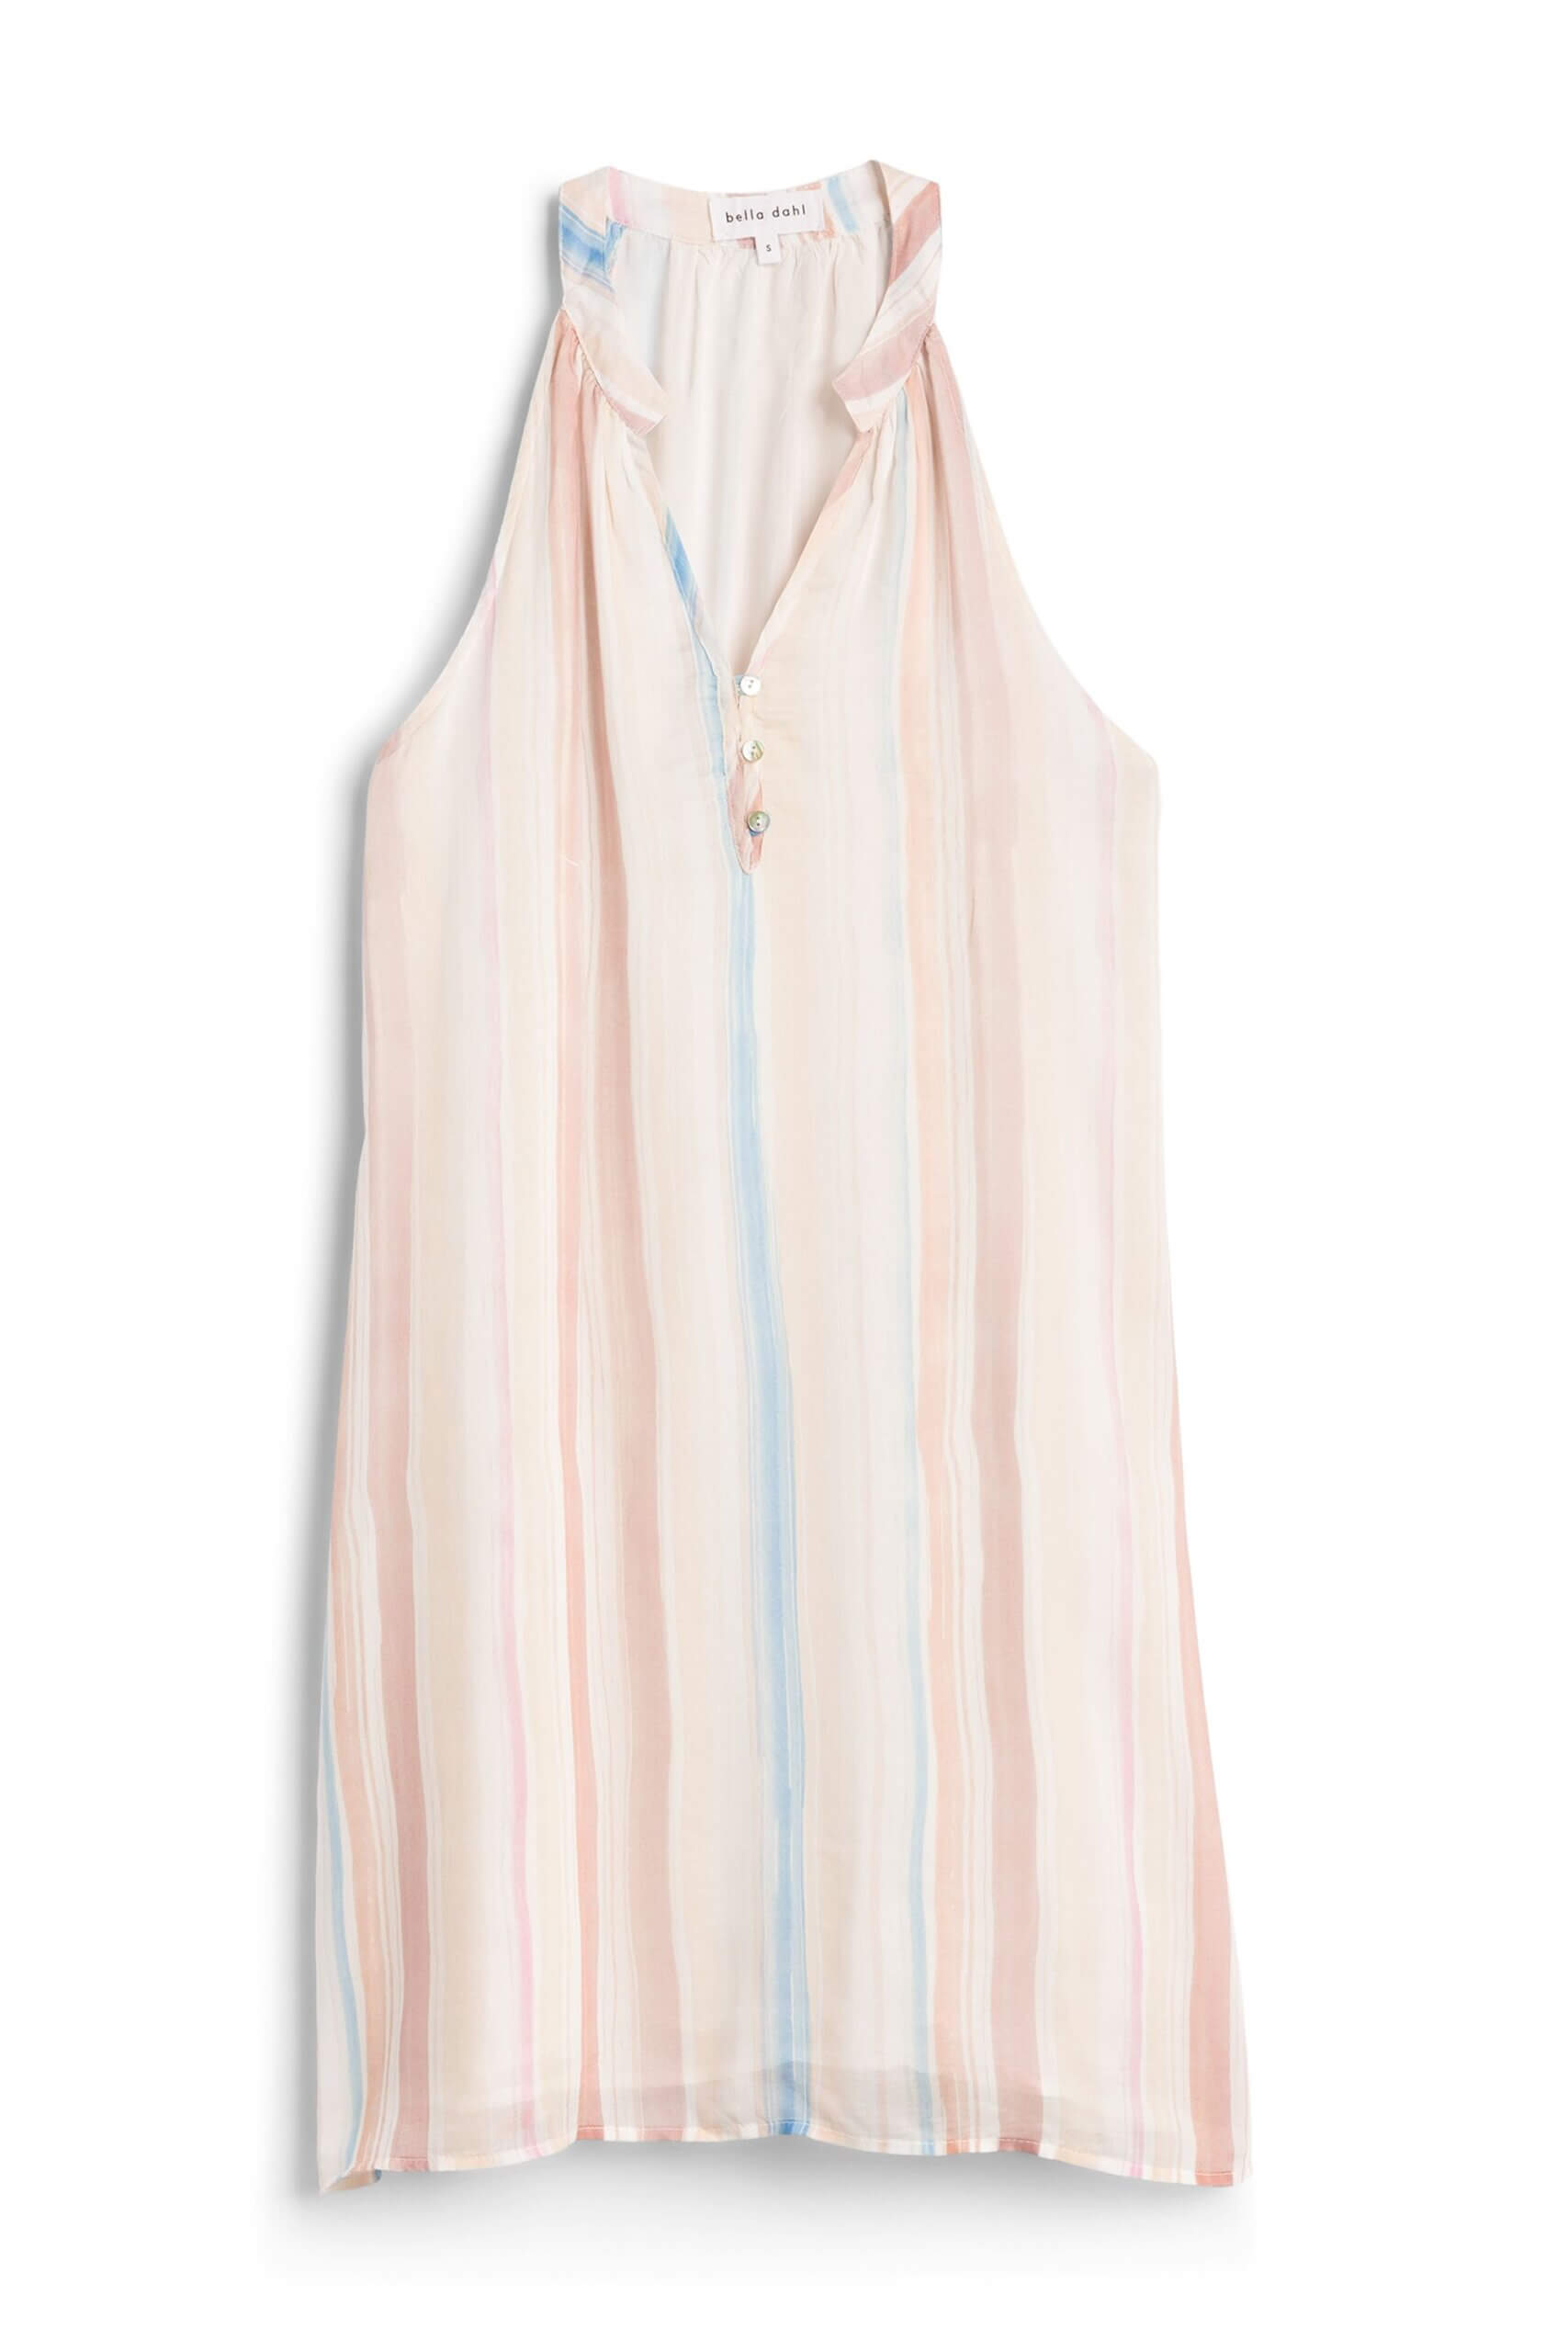 Stitch Fix women's white shift dress with pastel-colored stripes.